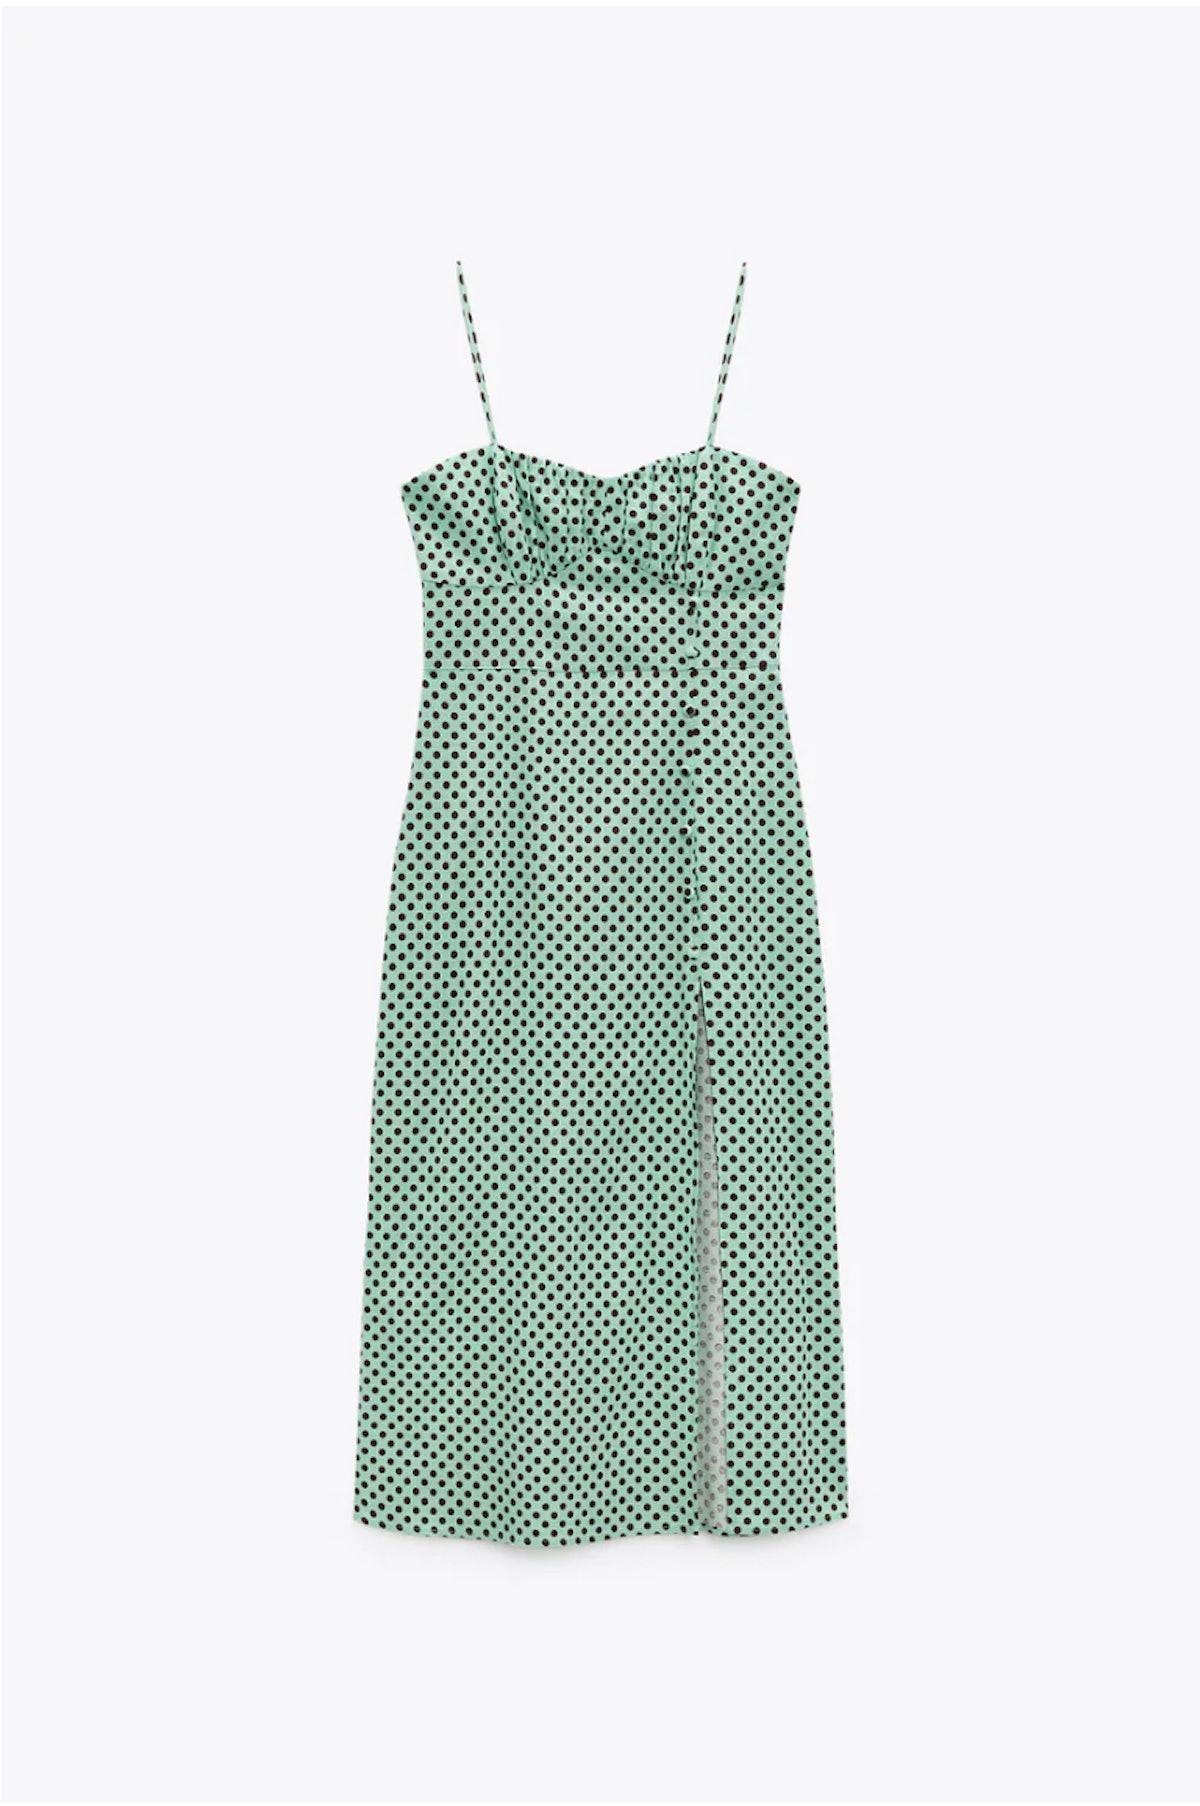 Zara's green and white linen blend polka dot dress.